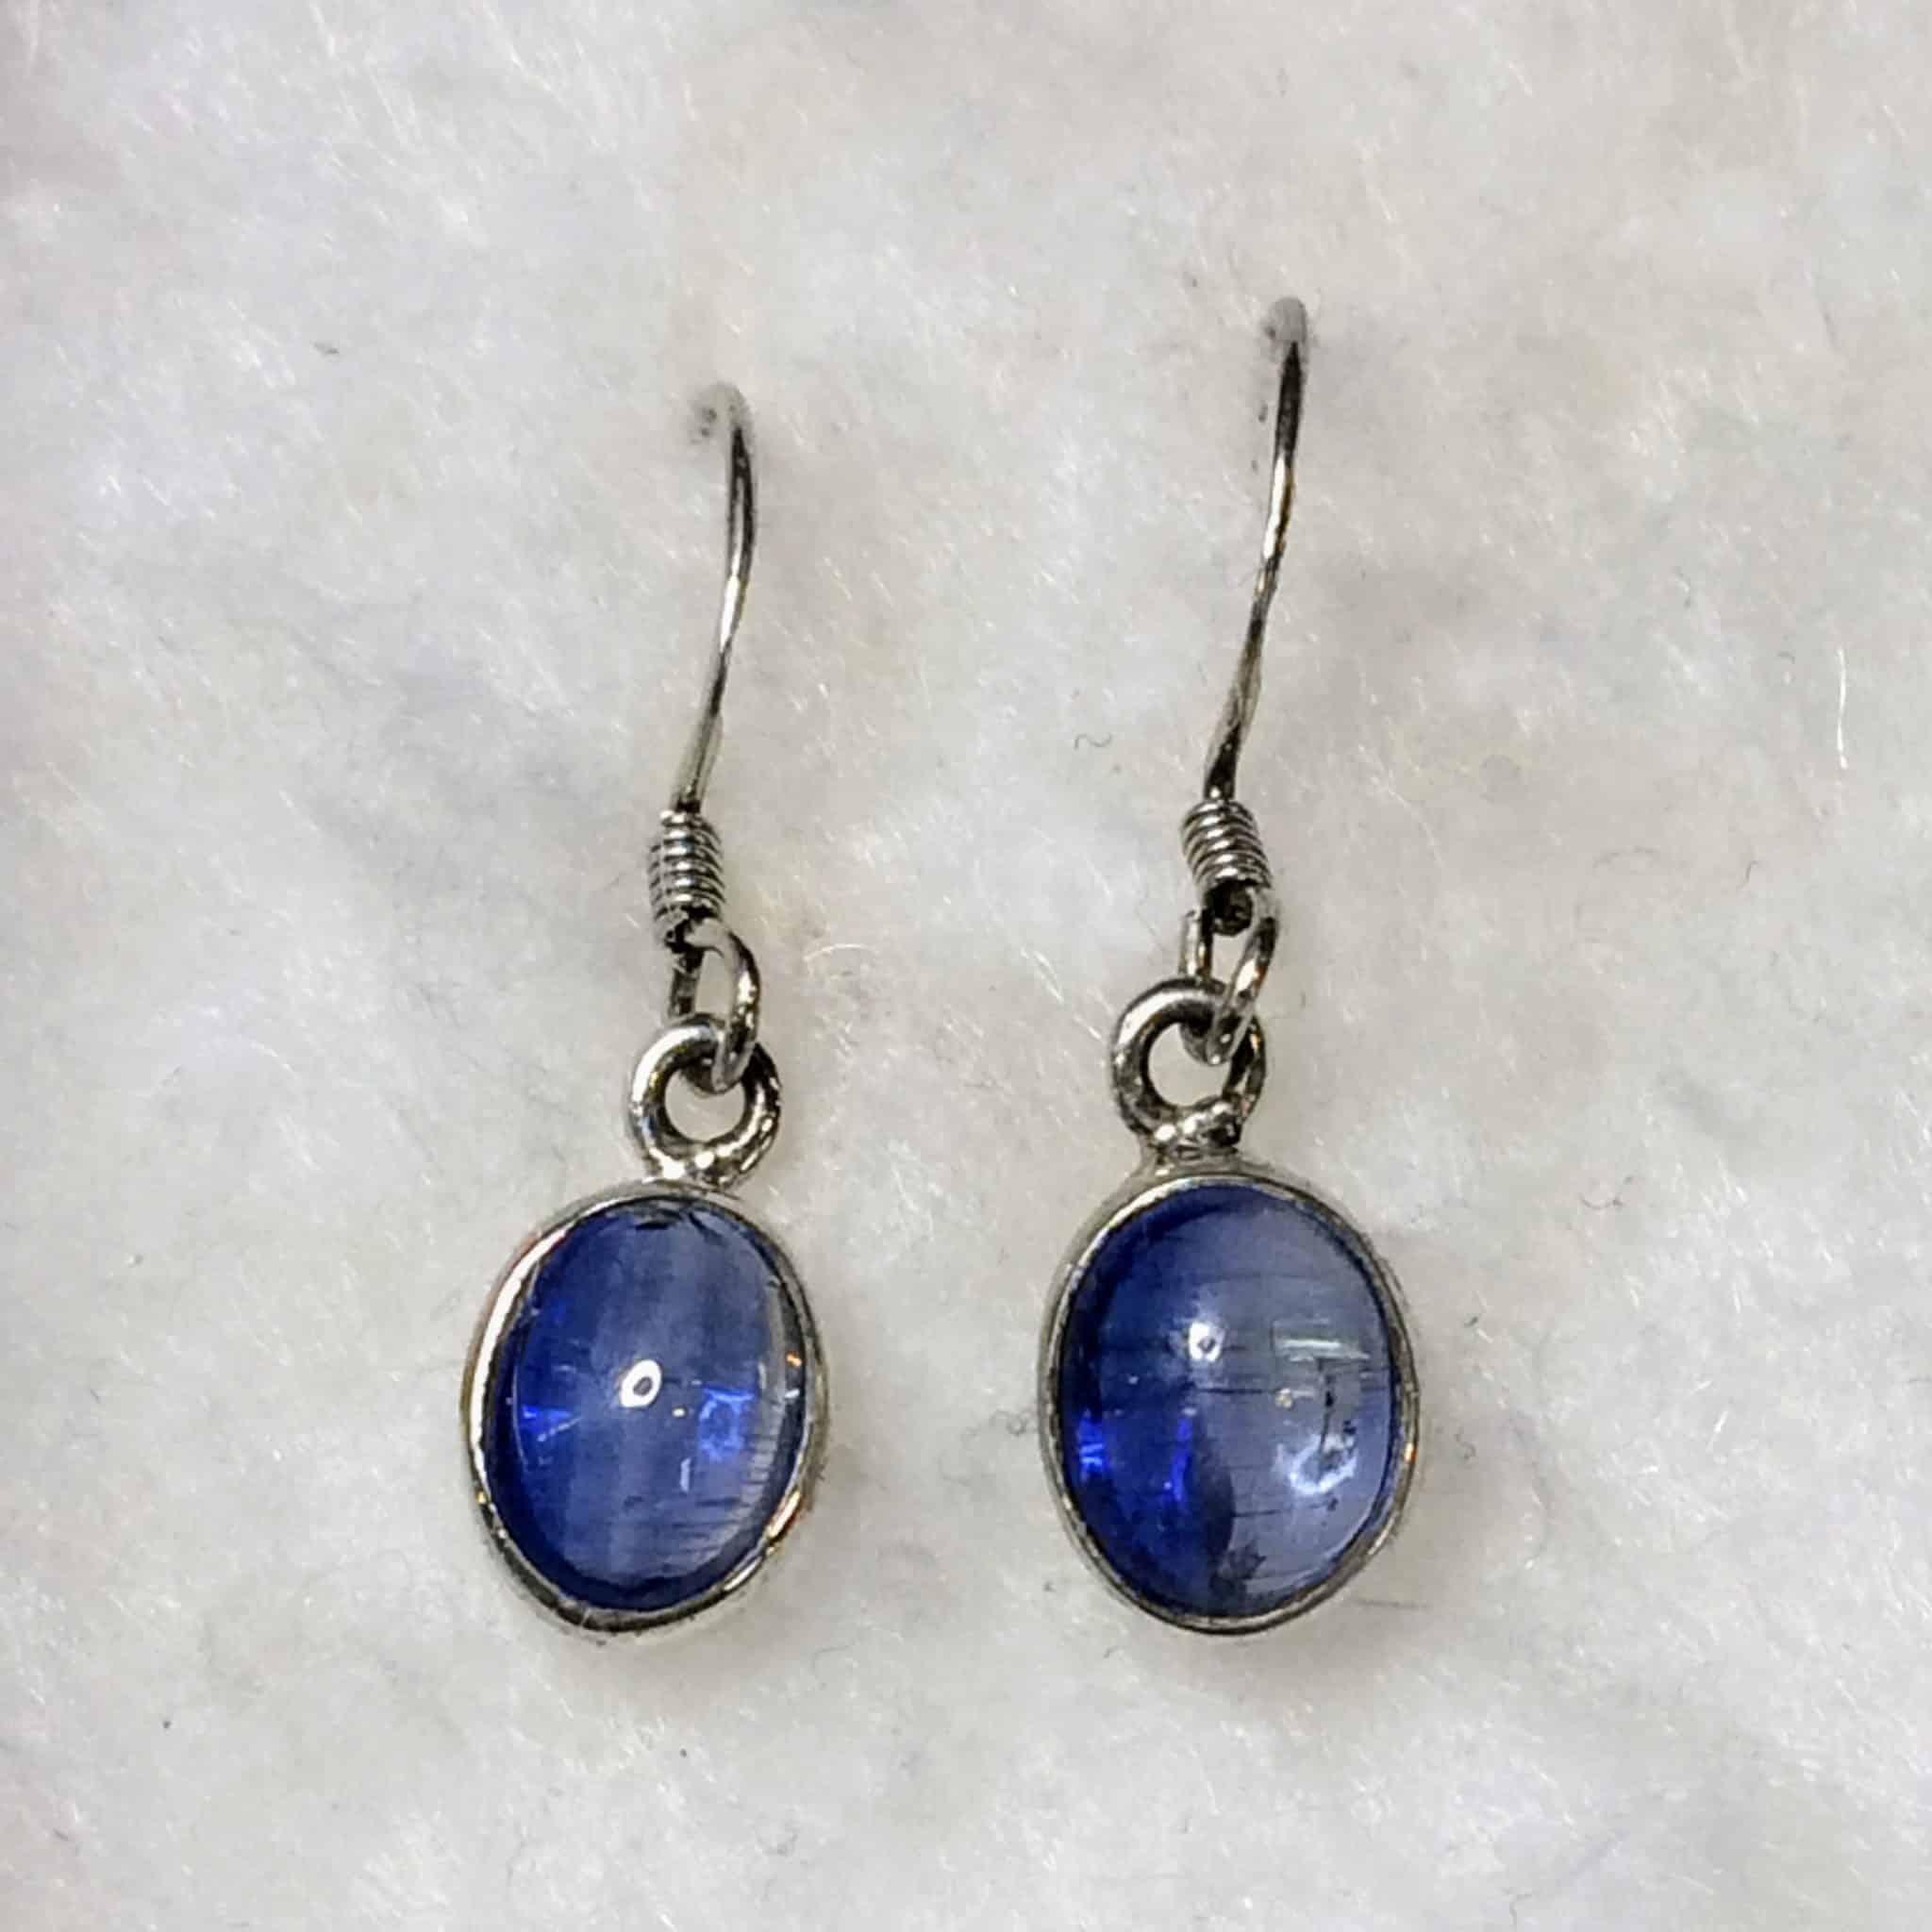 Blue Kyanite Polished Oval Earrings (Sterling Silver